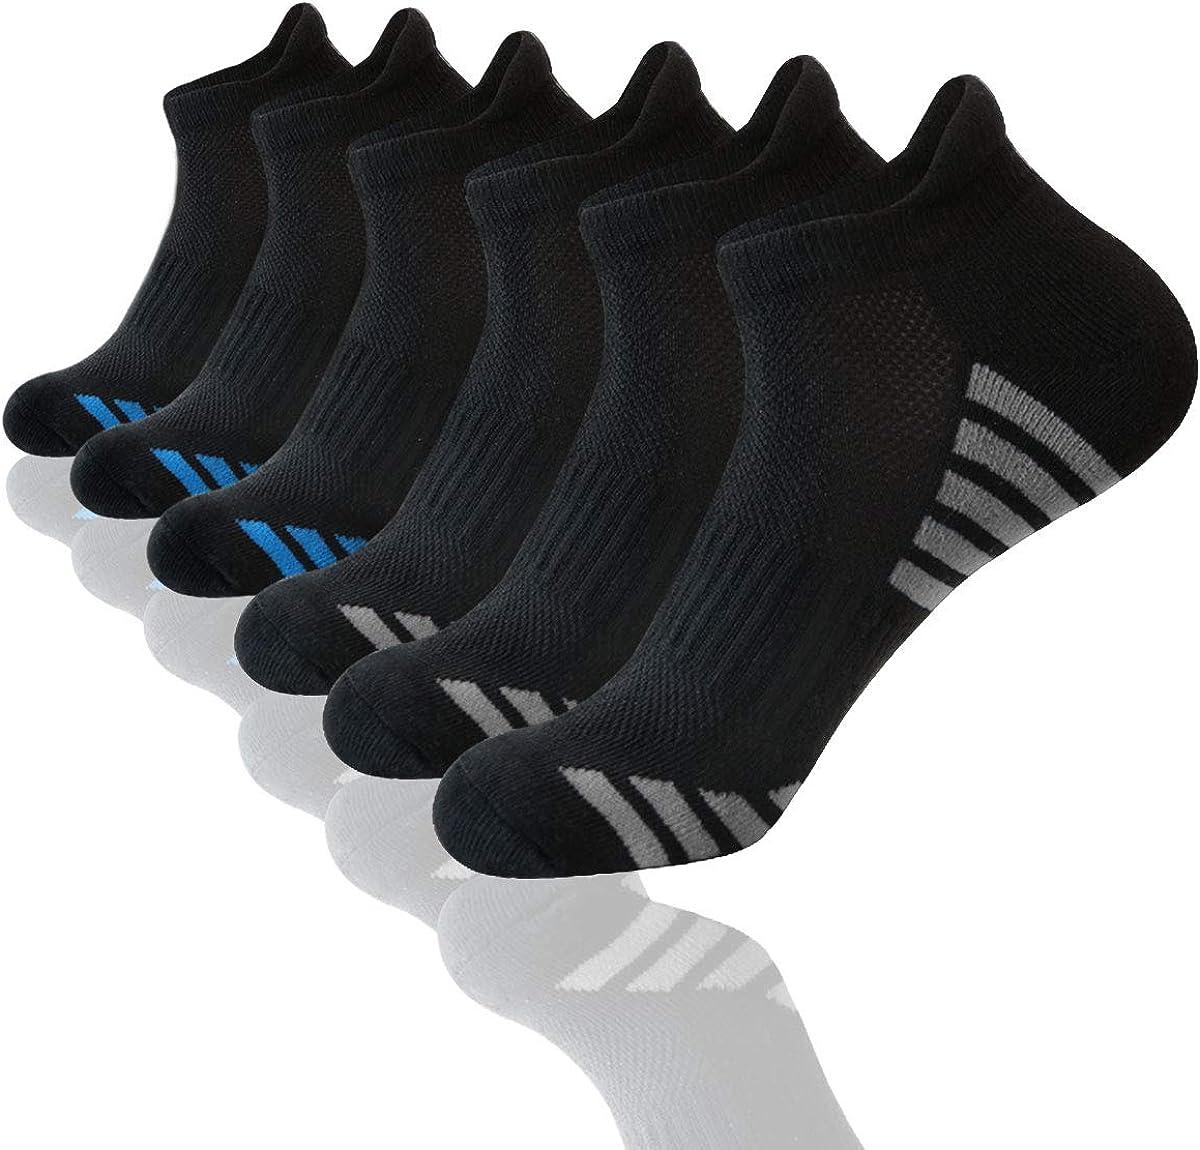 Shinno Mens Ankle Athletic Socks Low Cut Breathable Cushion Running Tab Socks 6 Pack